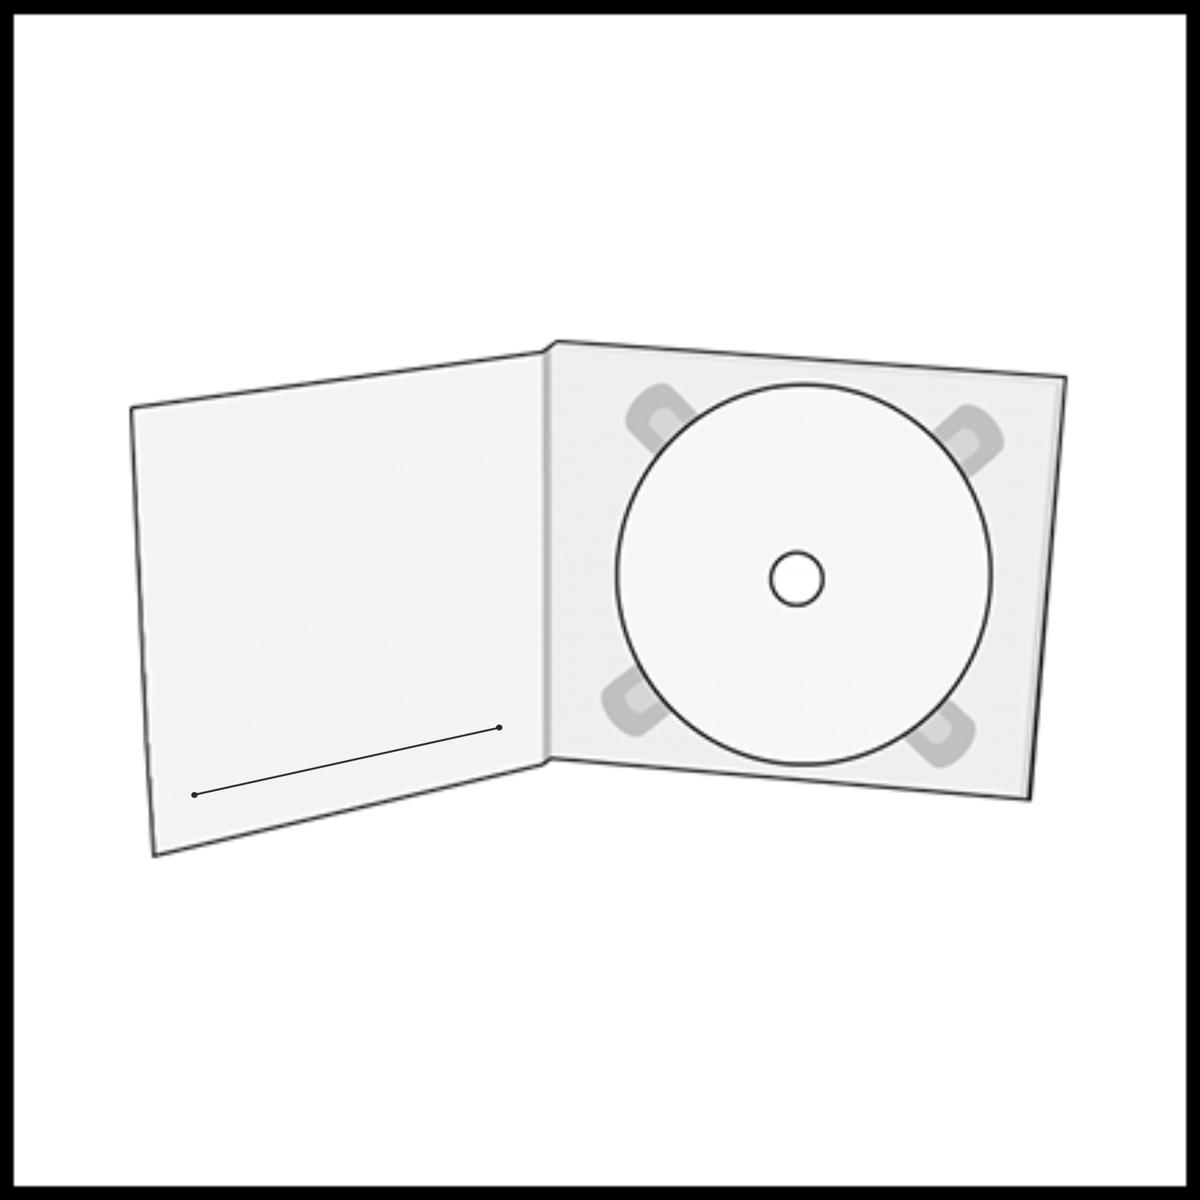 Image of CD DIGIPACK w/ SLOT